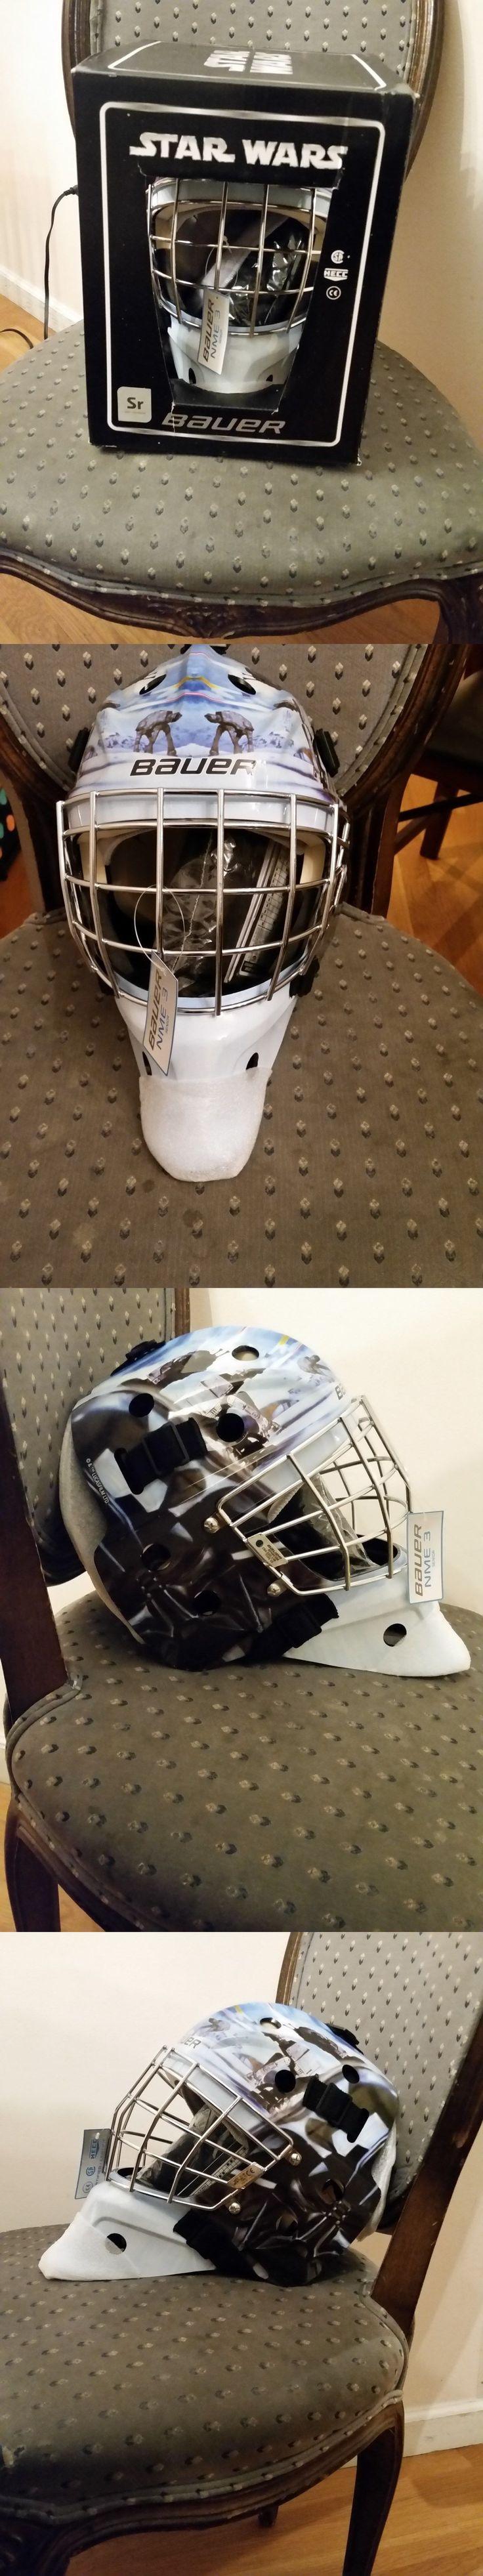 Face Masks 79762: Bauer Senior Nme3 Ice Hockey Goalie Helmet Mask Star Wars Darth Vader Head Sr -> BUY IT NOW ONLY: $139.99 on eBay!